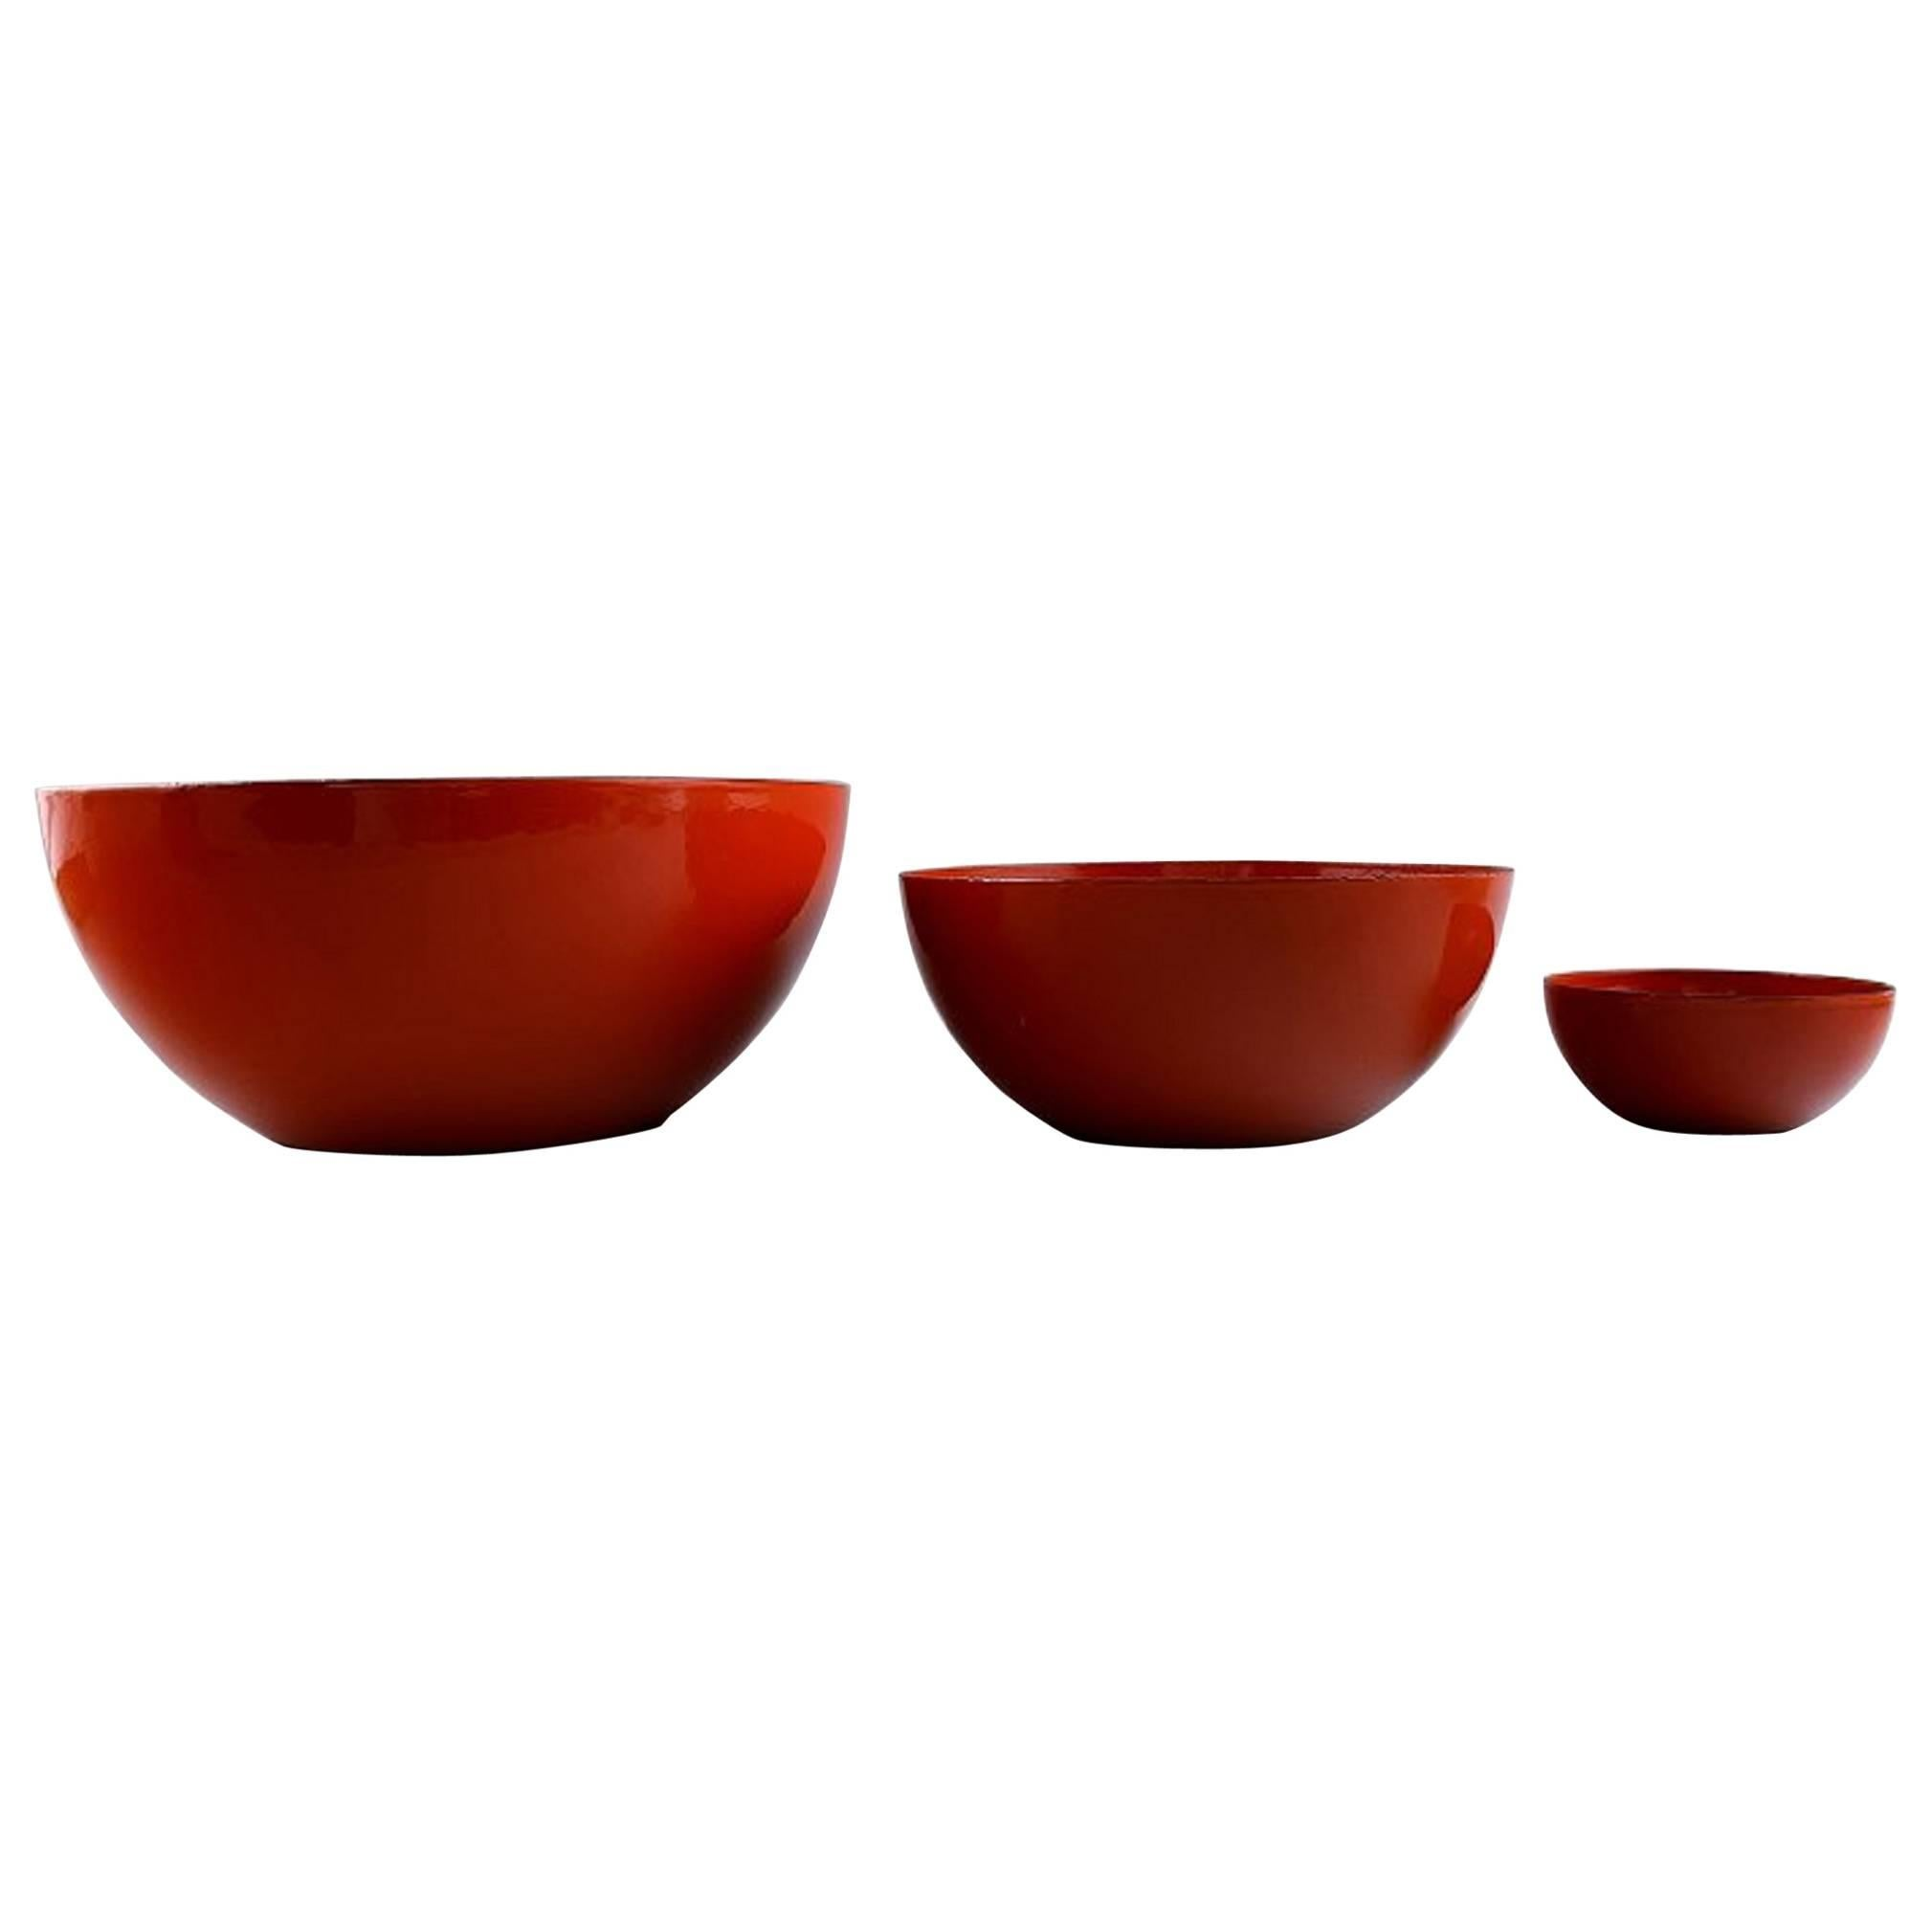 Kaj Franck, Finnish Designer Three Red Bowls in Enameled Metal, Finel, Finland